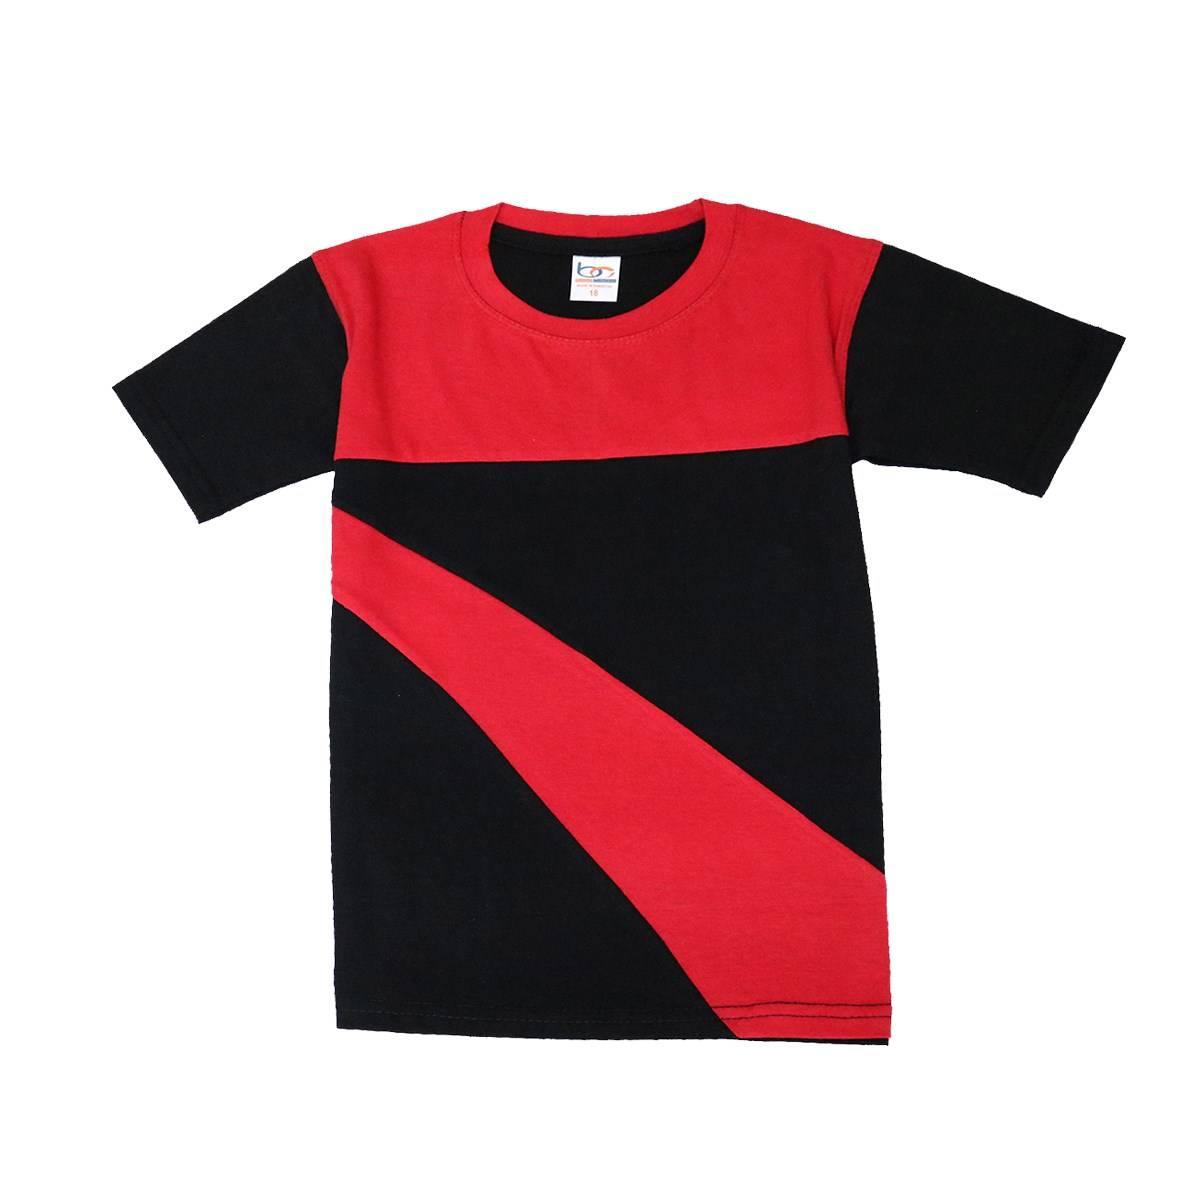 Bindas Collection Summer Stylish Contrast Panel design T-shirt For Kids